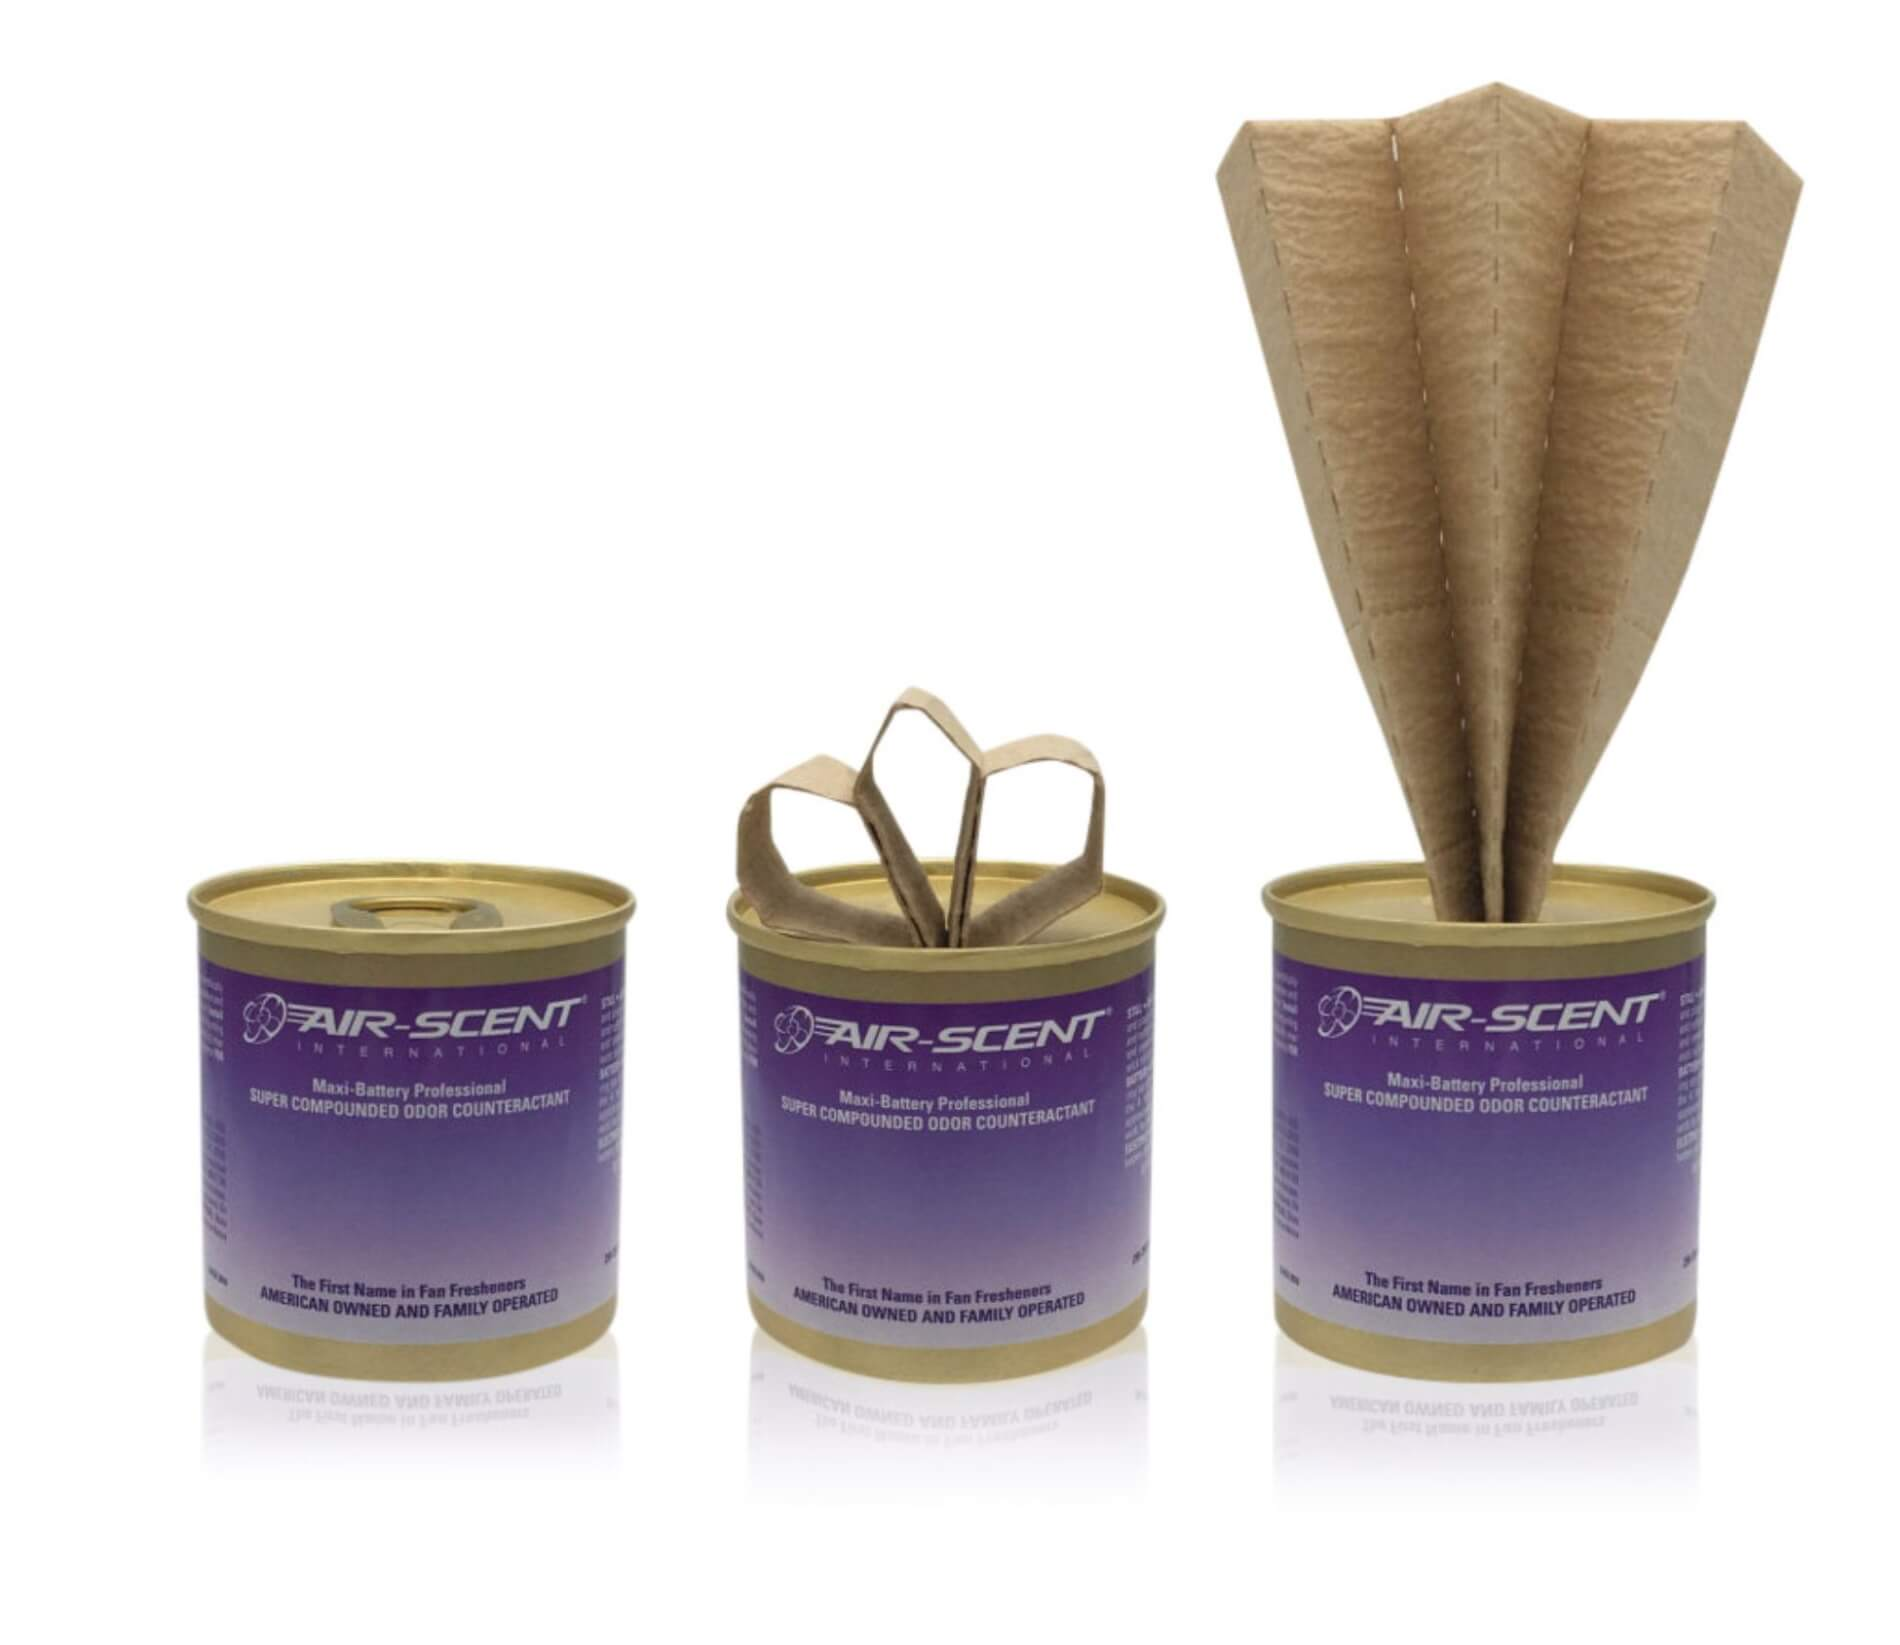 Air Scent Odor Counteractant Refills